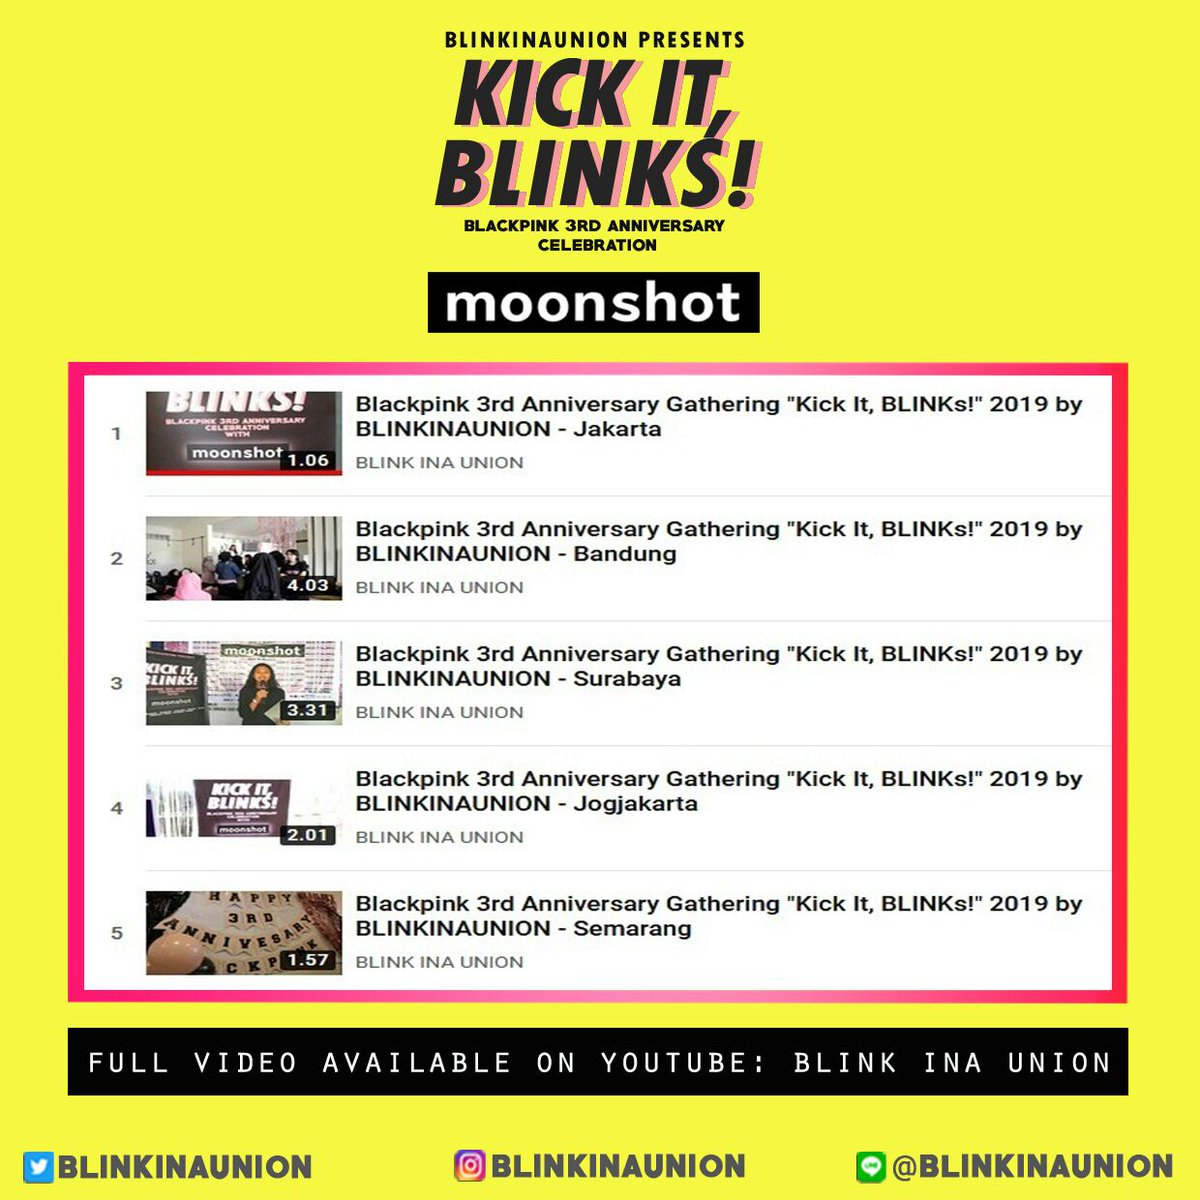 [ VIDEO BLACKPINK 3rd ANNIVERSARY GATHERING Kick It, Blinks! 2019 by @blinkinaunion x @moonshot_idn ] Terimakasih BLINK INDONESIA! LINK VIDEO PLAYLIST » youtube.com/playlist?list=… Jangan lupa LIKE & SUBSCRIBE YouTube Channel: BLINK INA UNION » youtube.com/channel/UC7j9W…